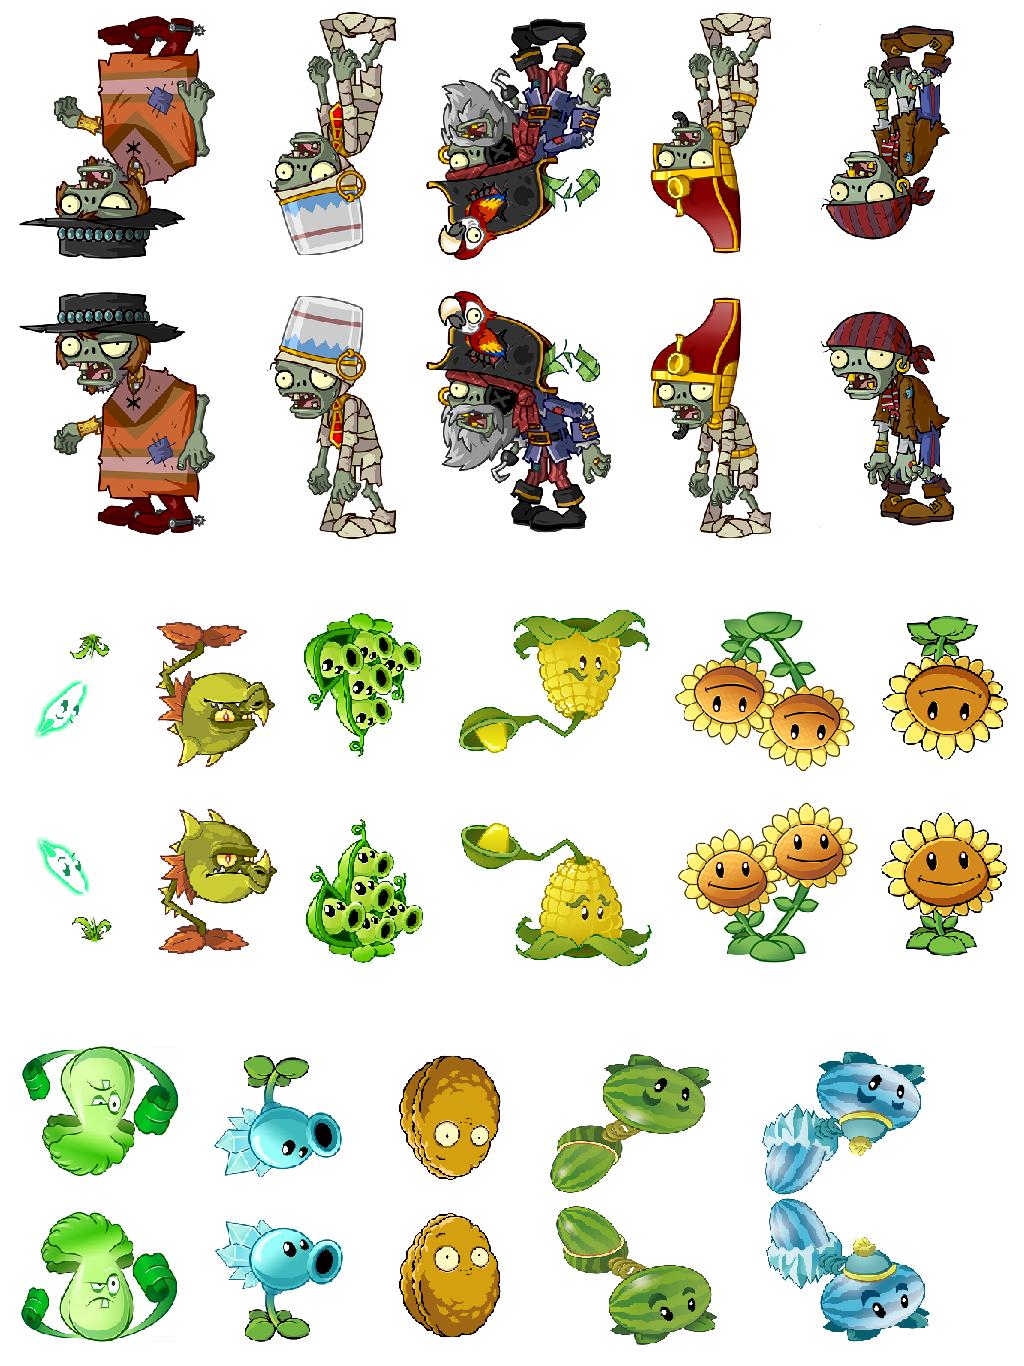 Plants Vs Zombies Part 2 Of 534975348754893754893574